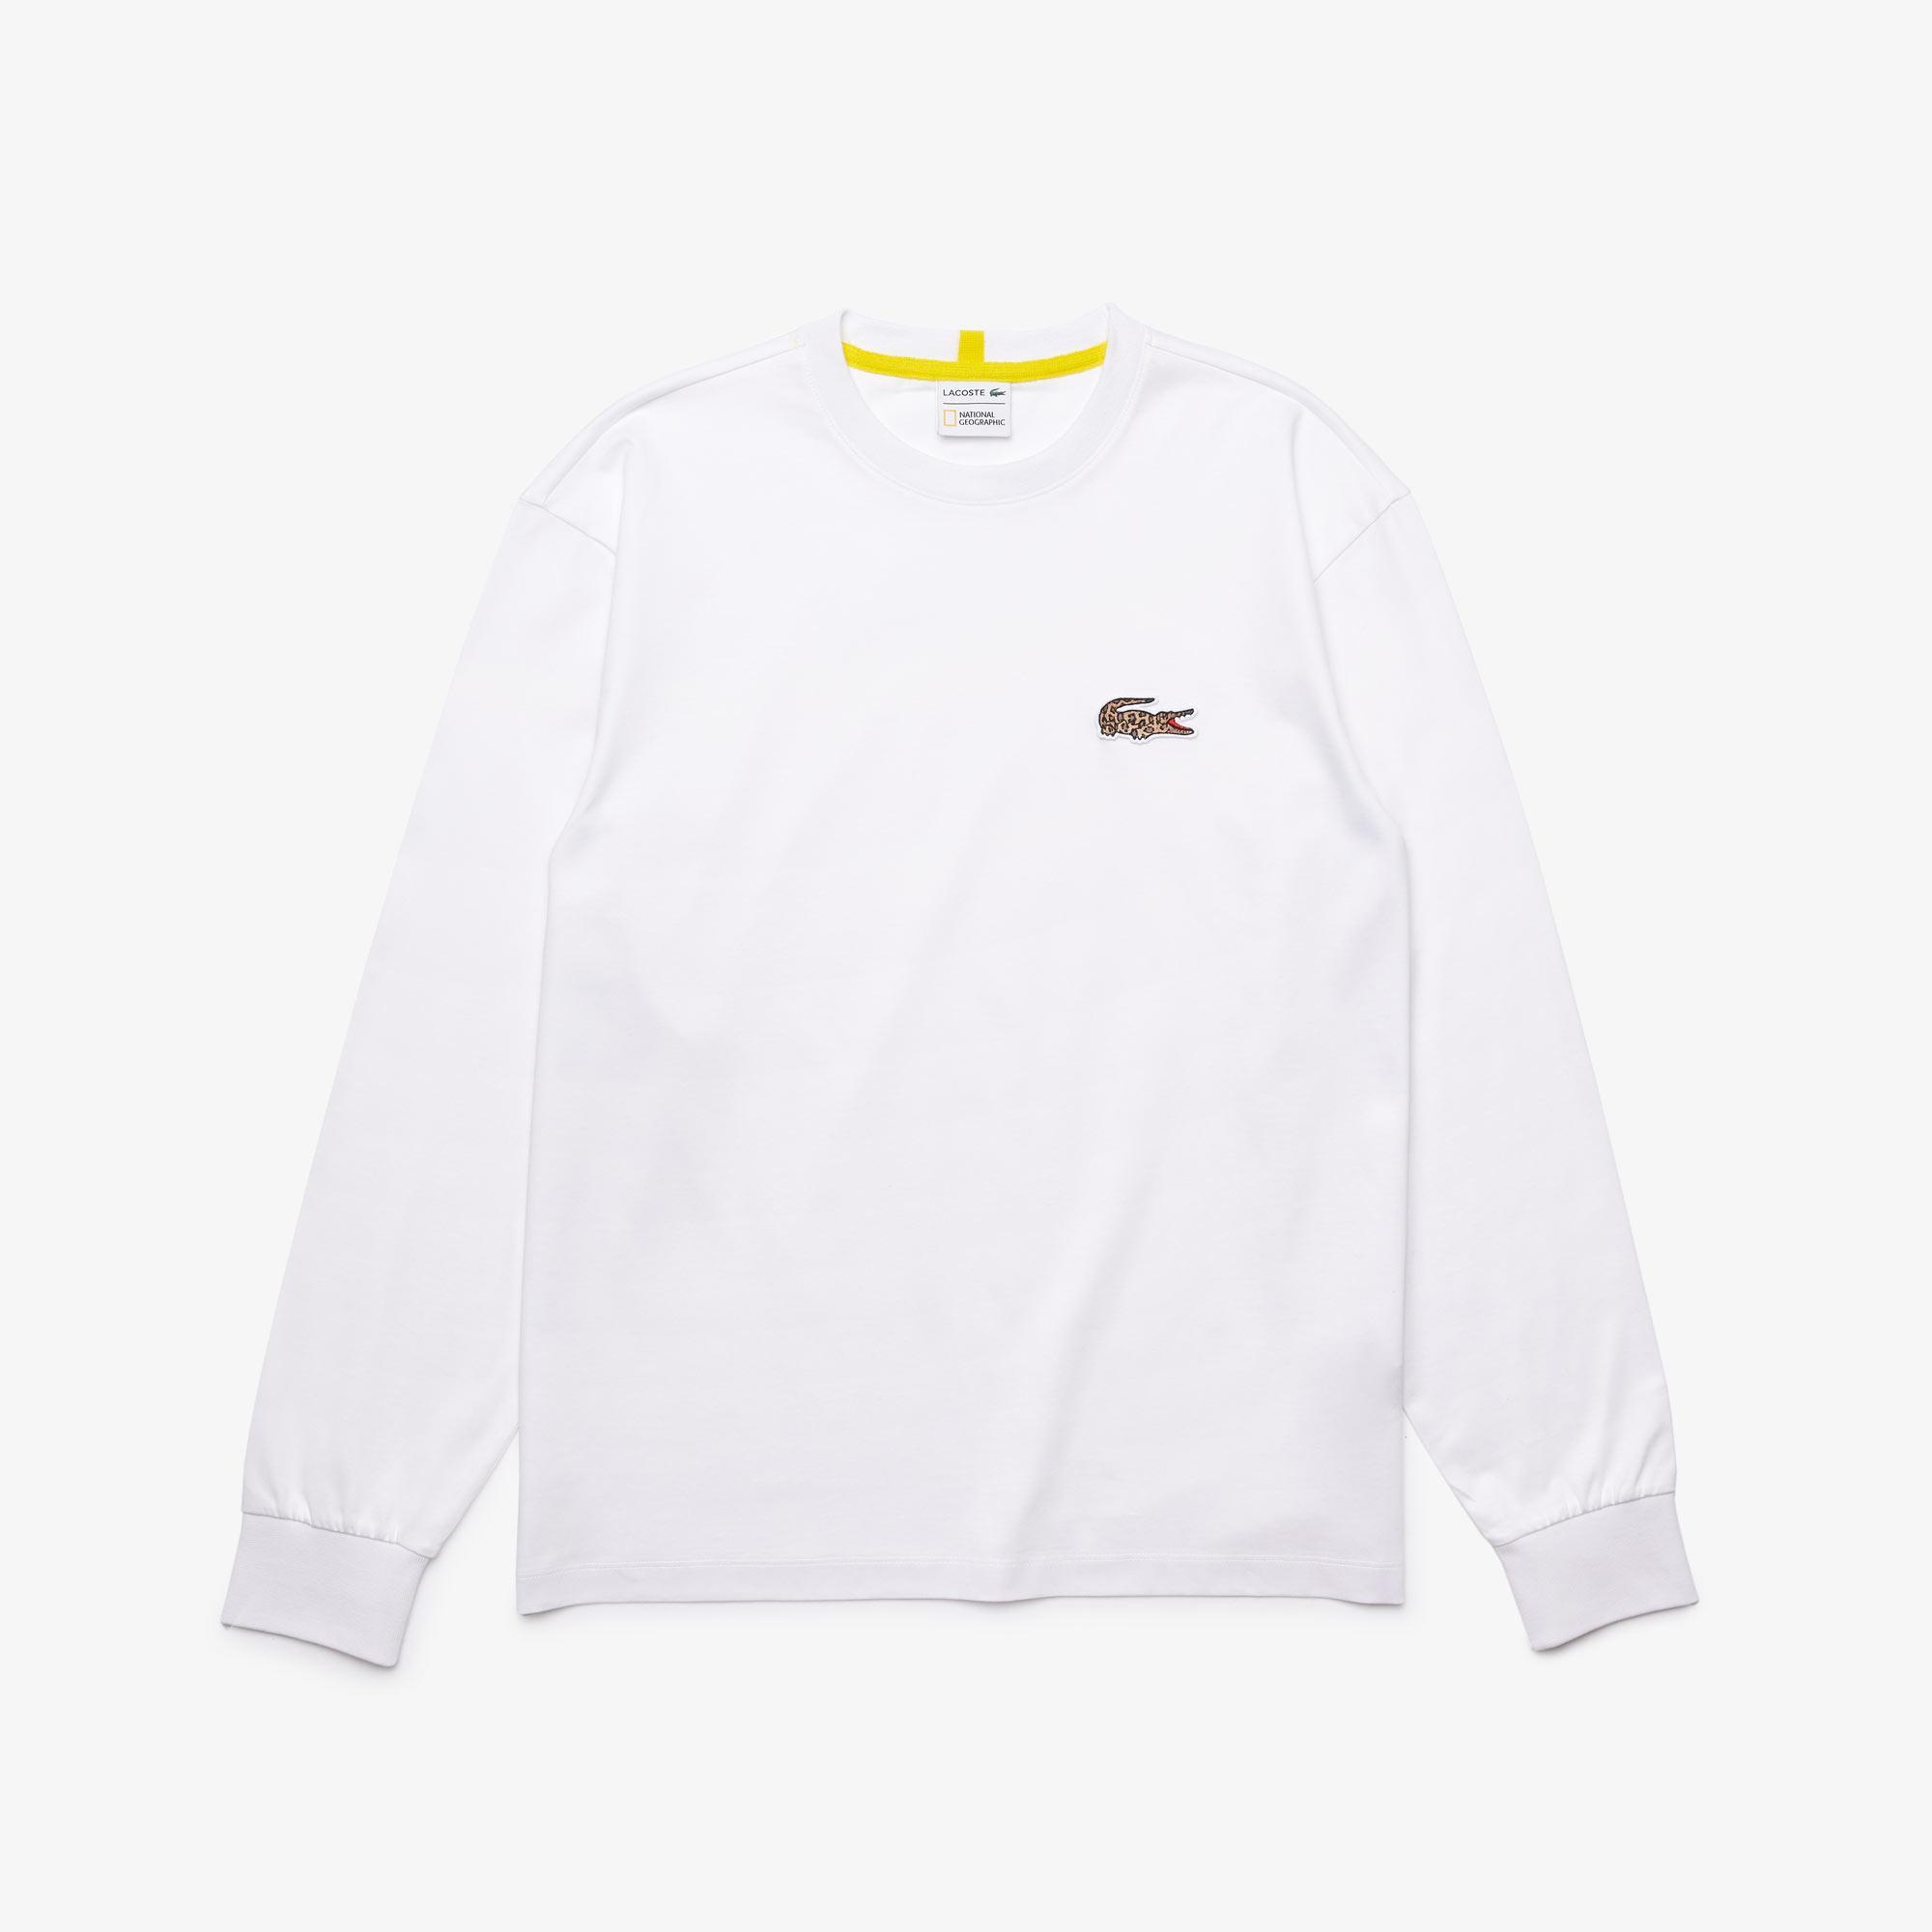 Lacoste X National Geographic Męski T-Shirt Bawełniany